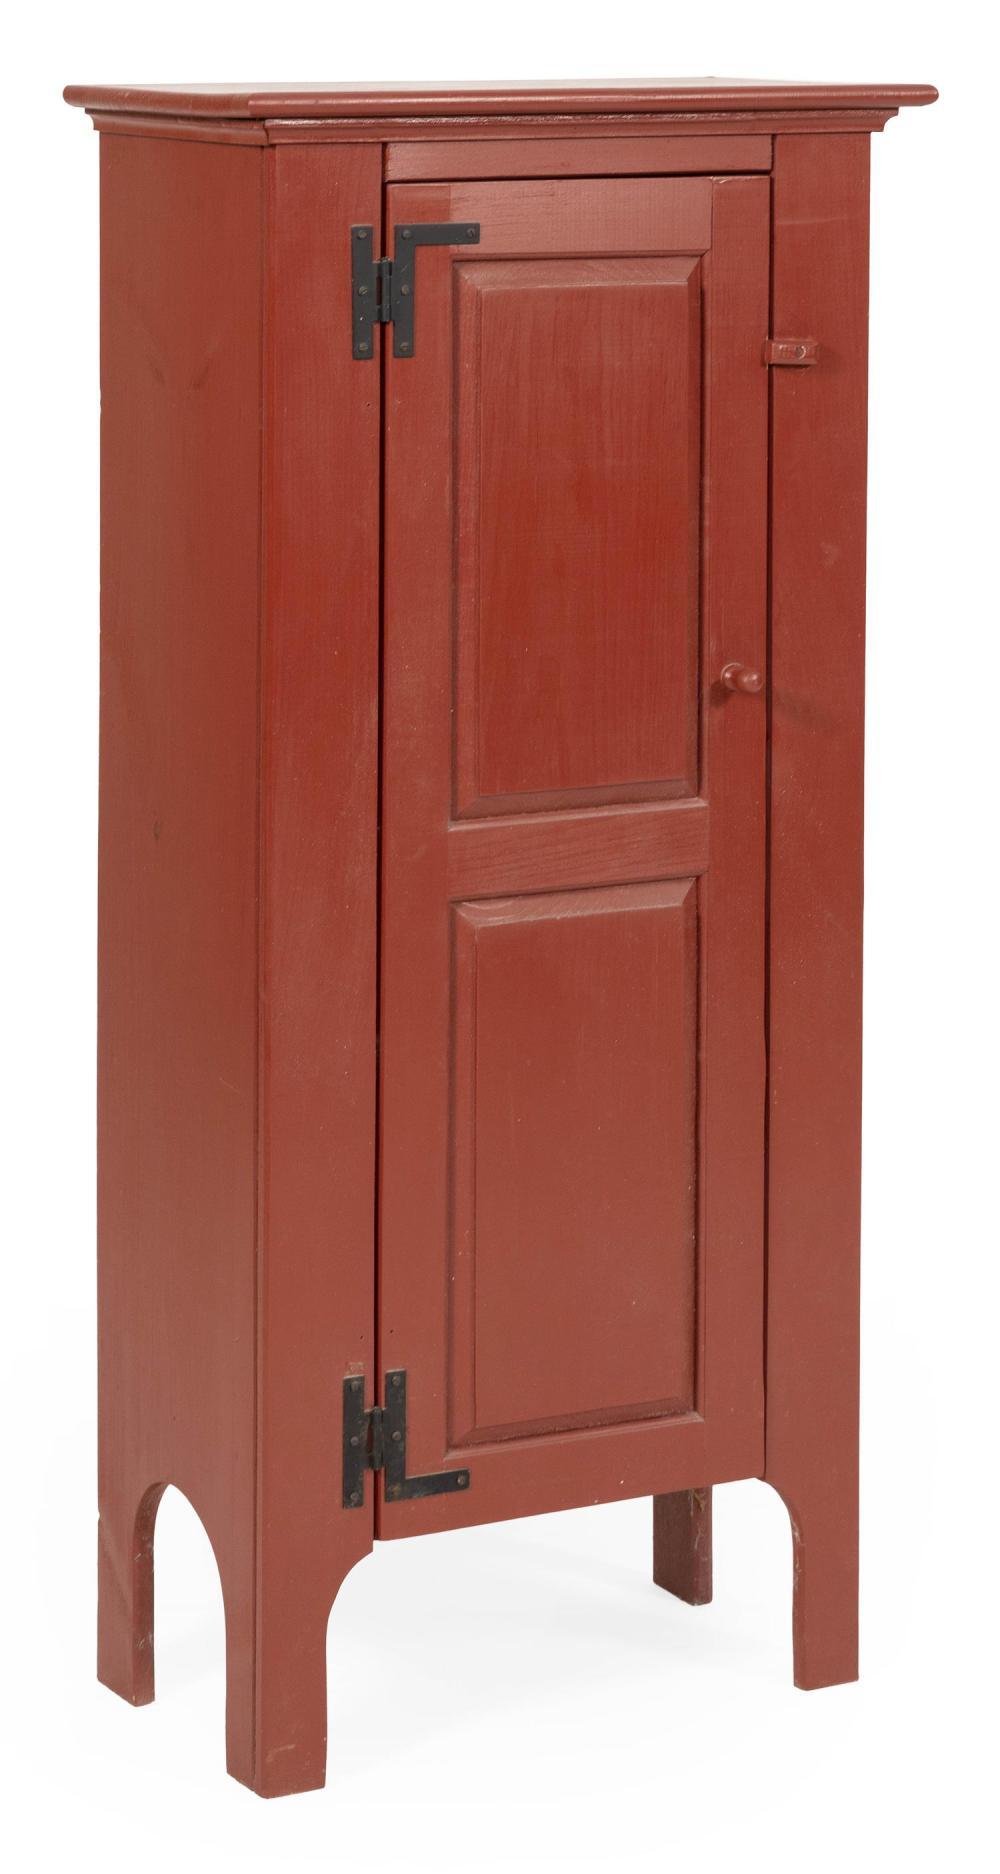 "CHIMNEY CUPBOARD Under deep red paint. Paneled door encloses four interior shelves. Height 51.25"". Width 23.25"". Depth 12.5""."